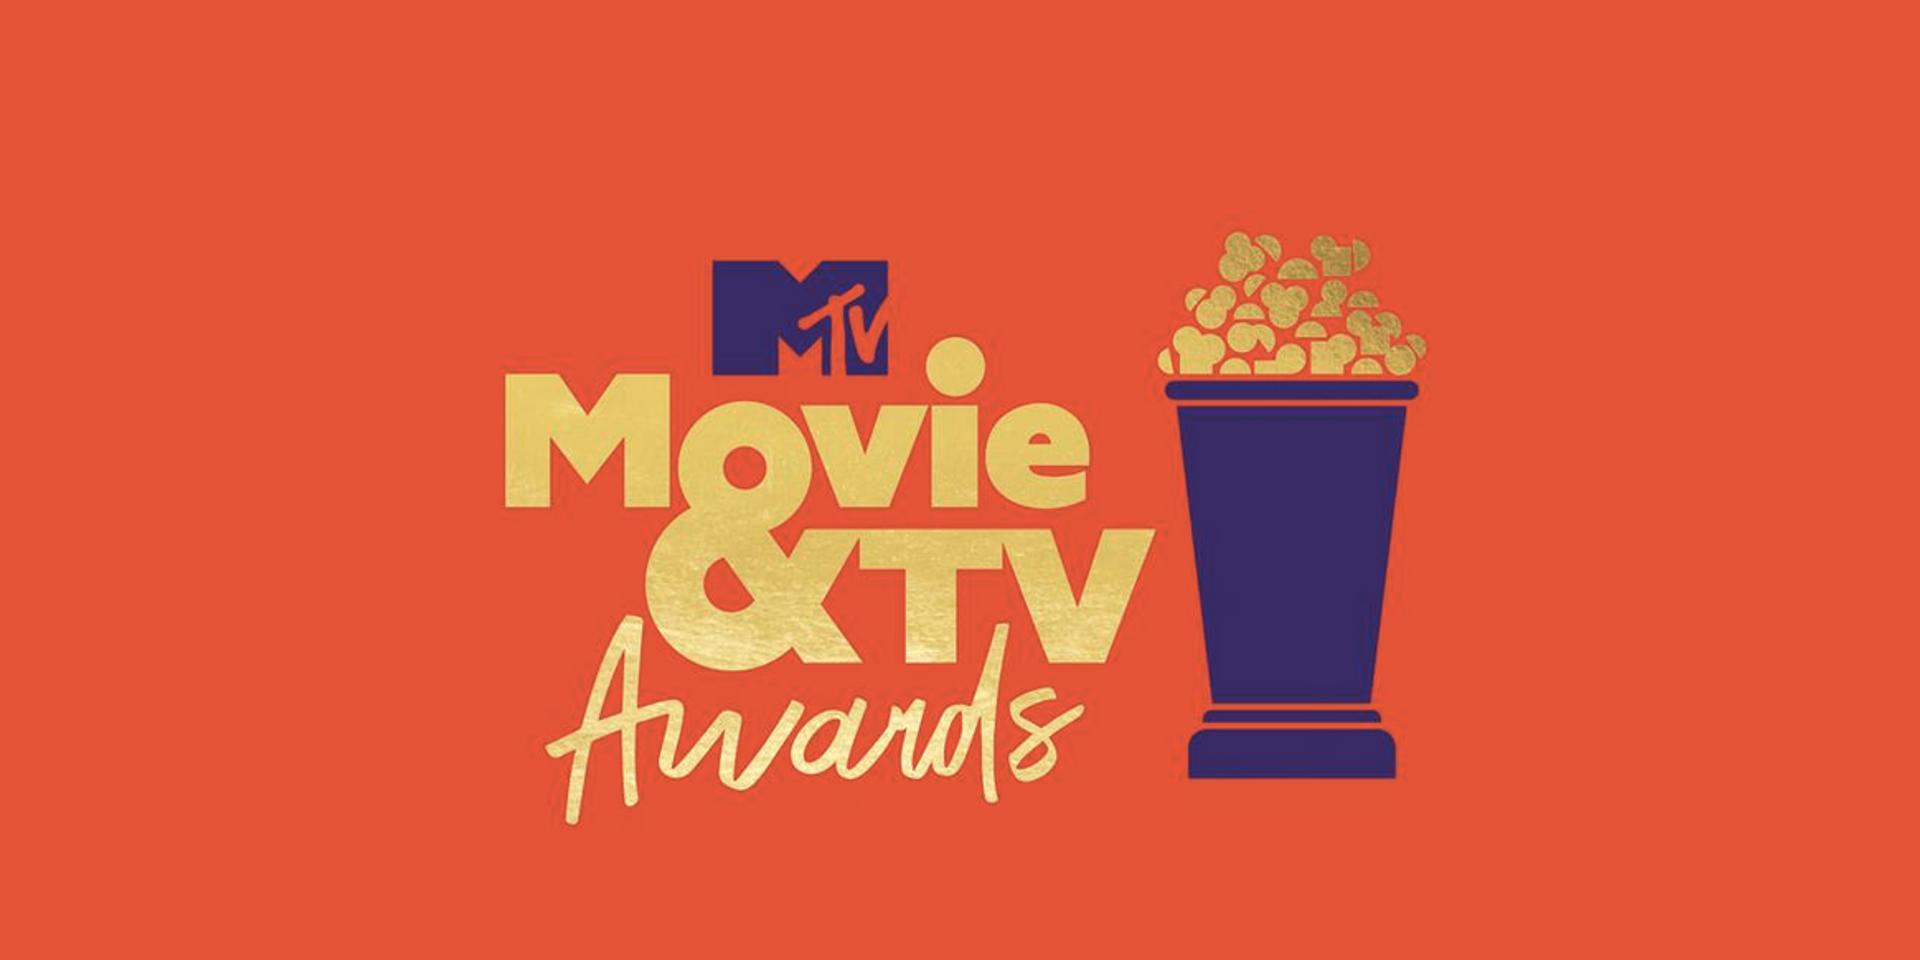 Bridgerton, BTS, Taylor Swift, WandaVision, and more are nominated at the 2021 MTV Movie & TV Awards